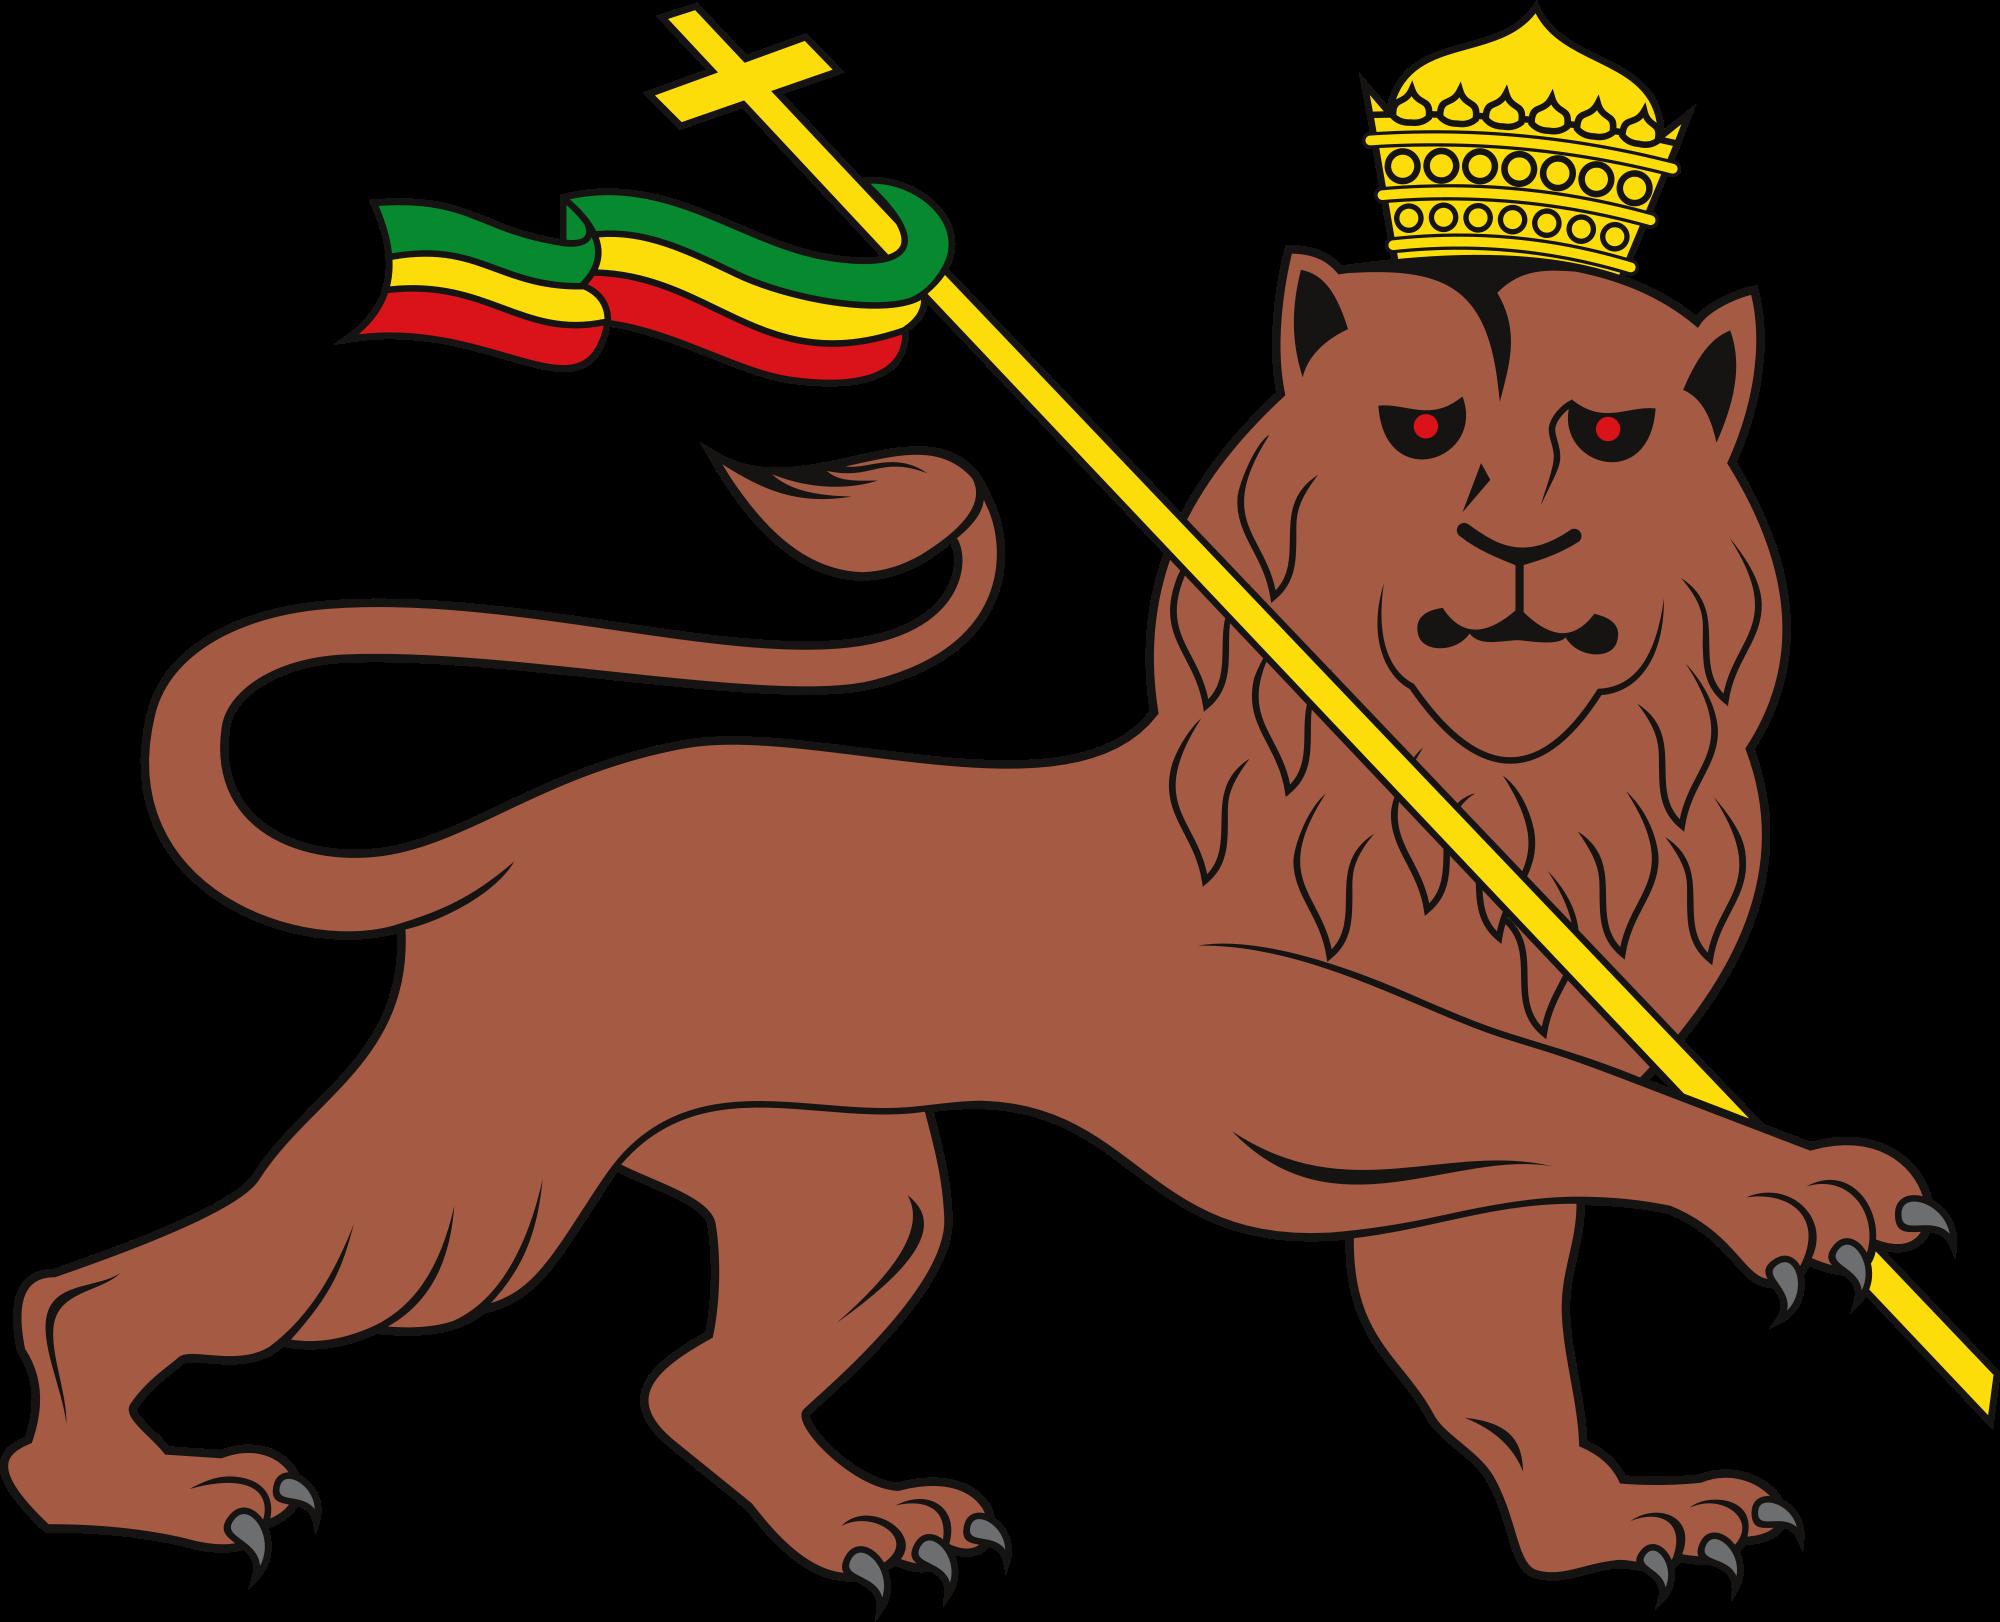 Clipart lion file. Of judah emblem the